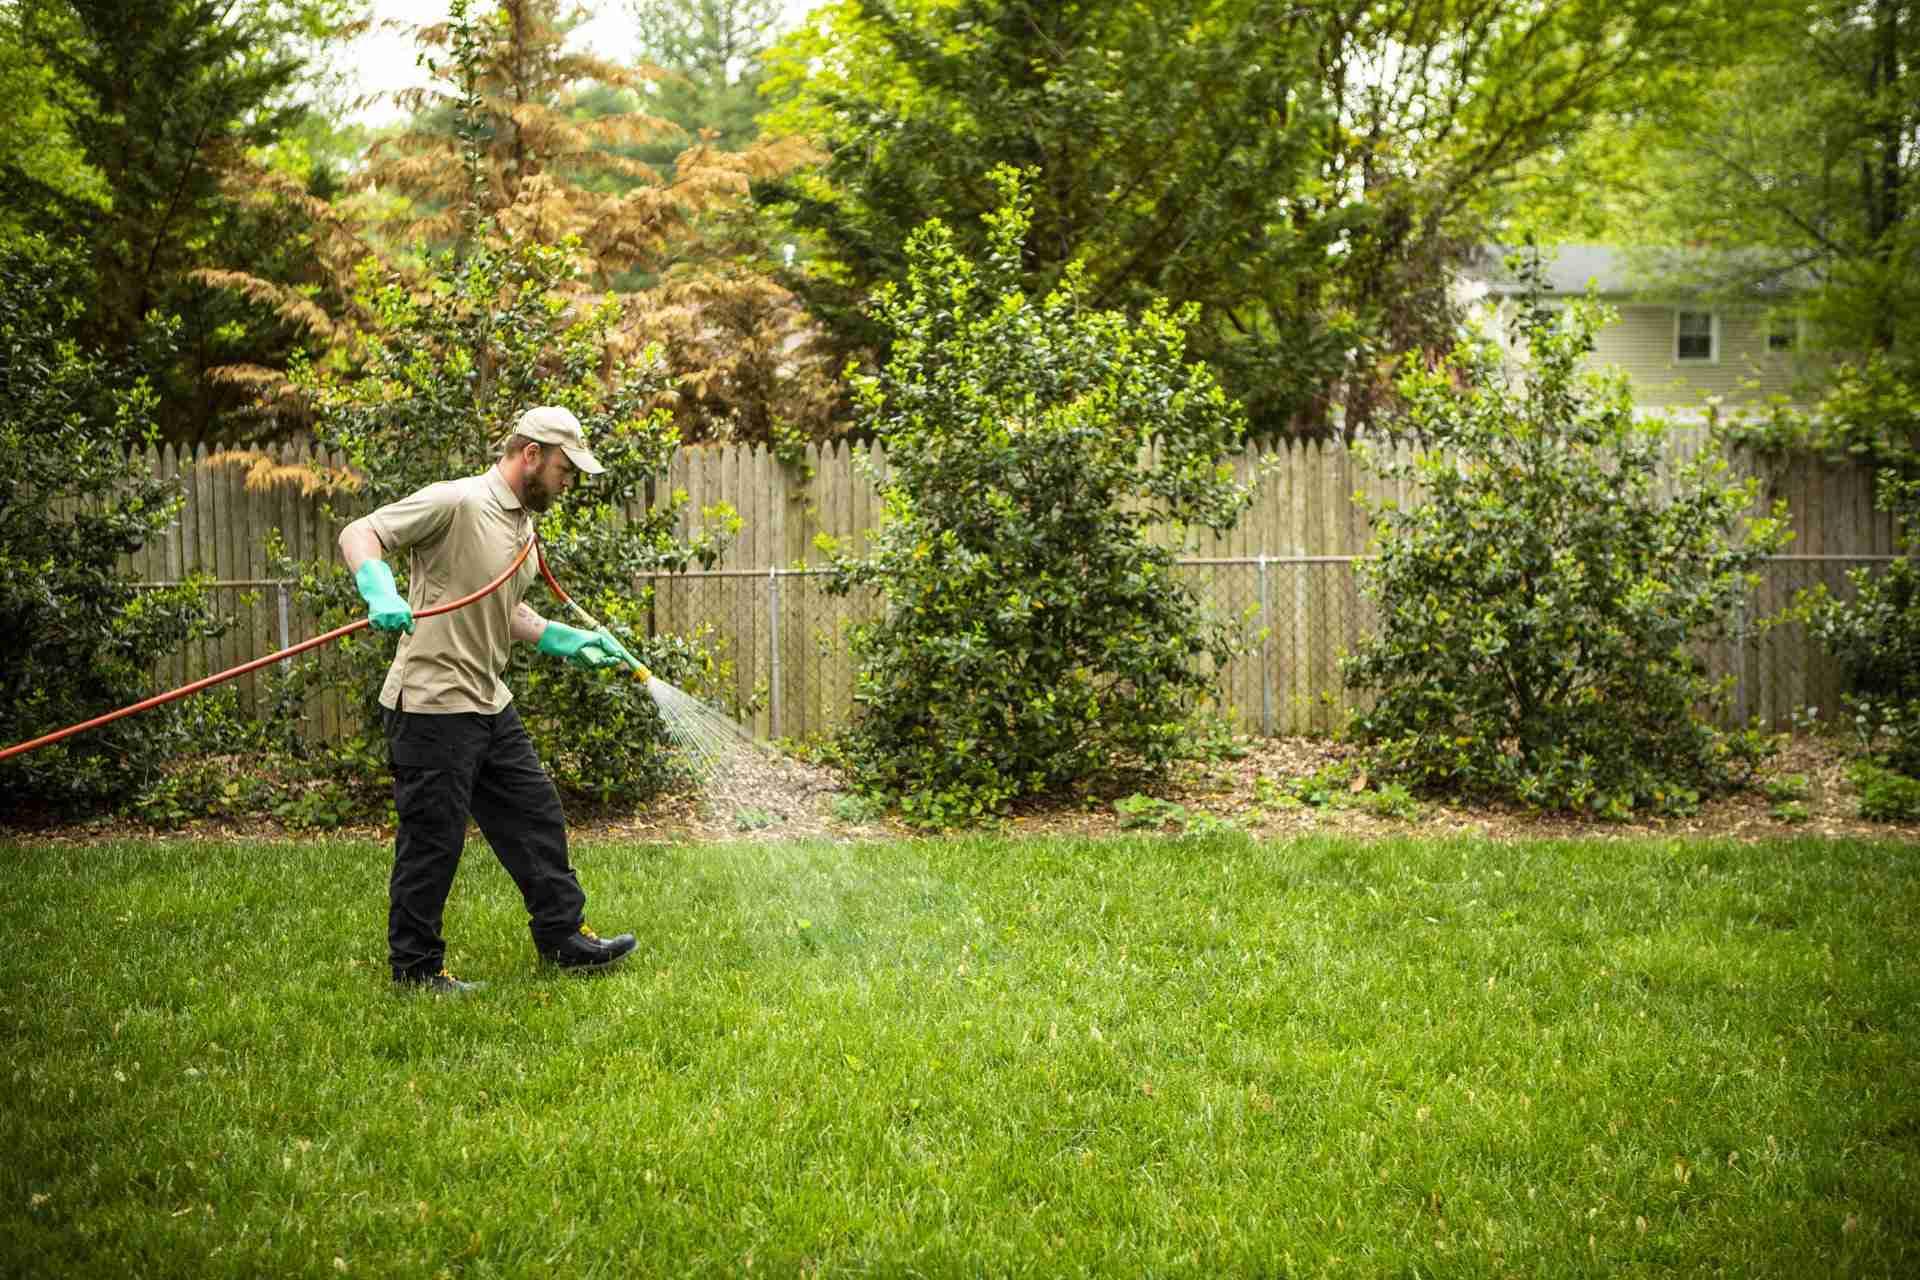 5 DIY Lawn Fertilizer Recipes that Actually Work